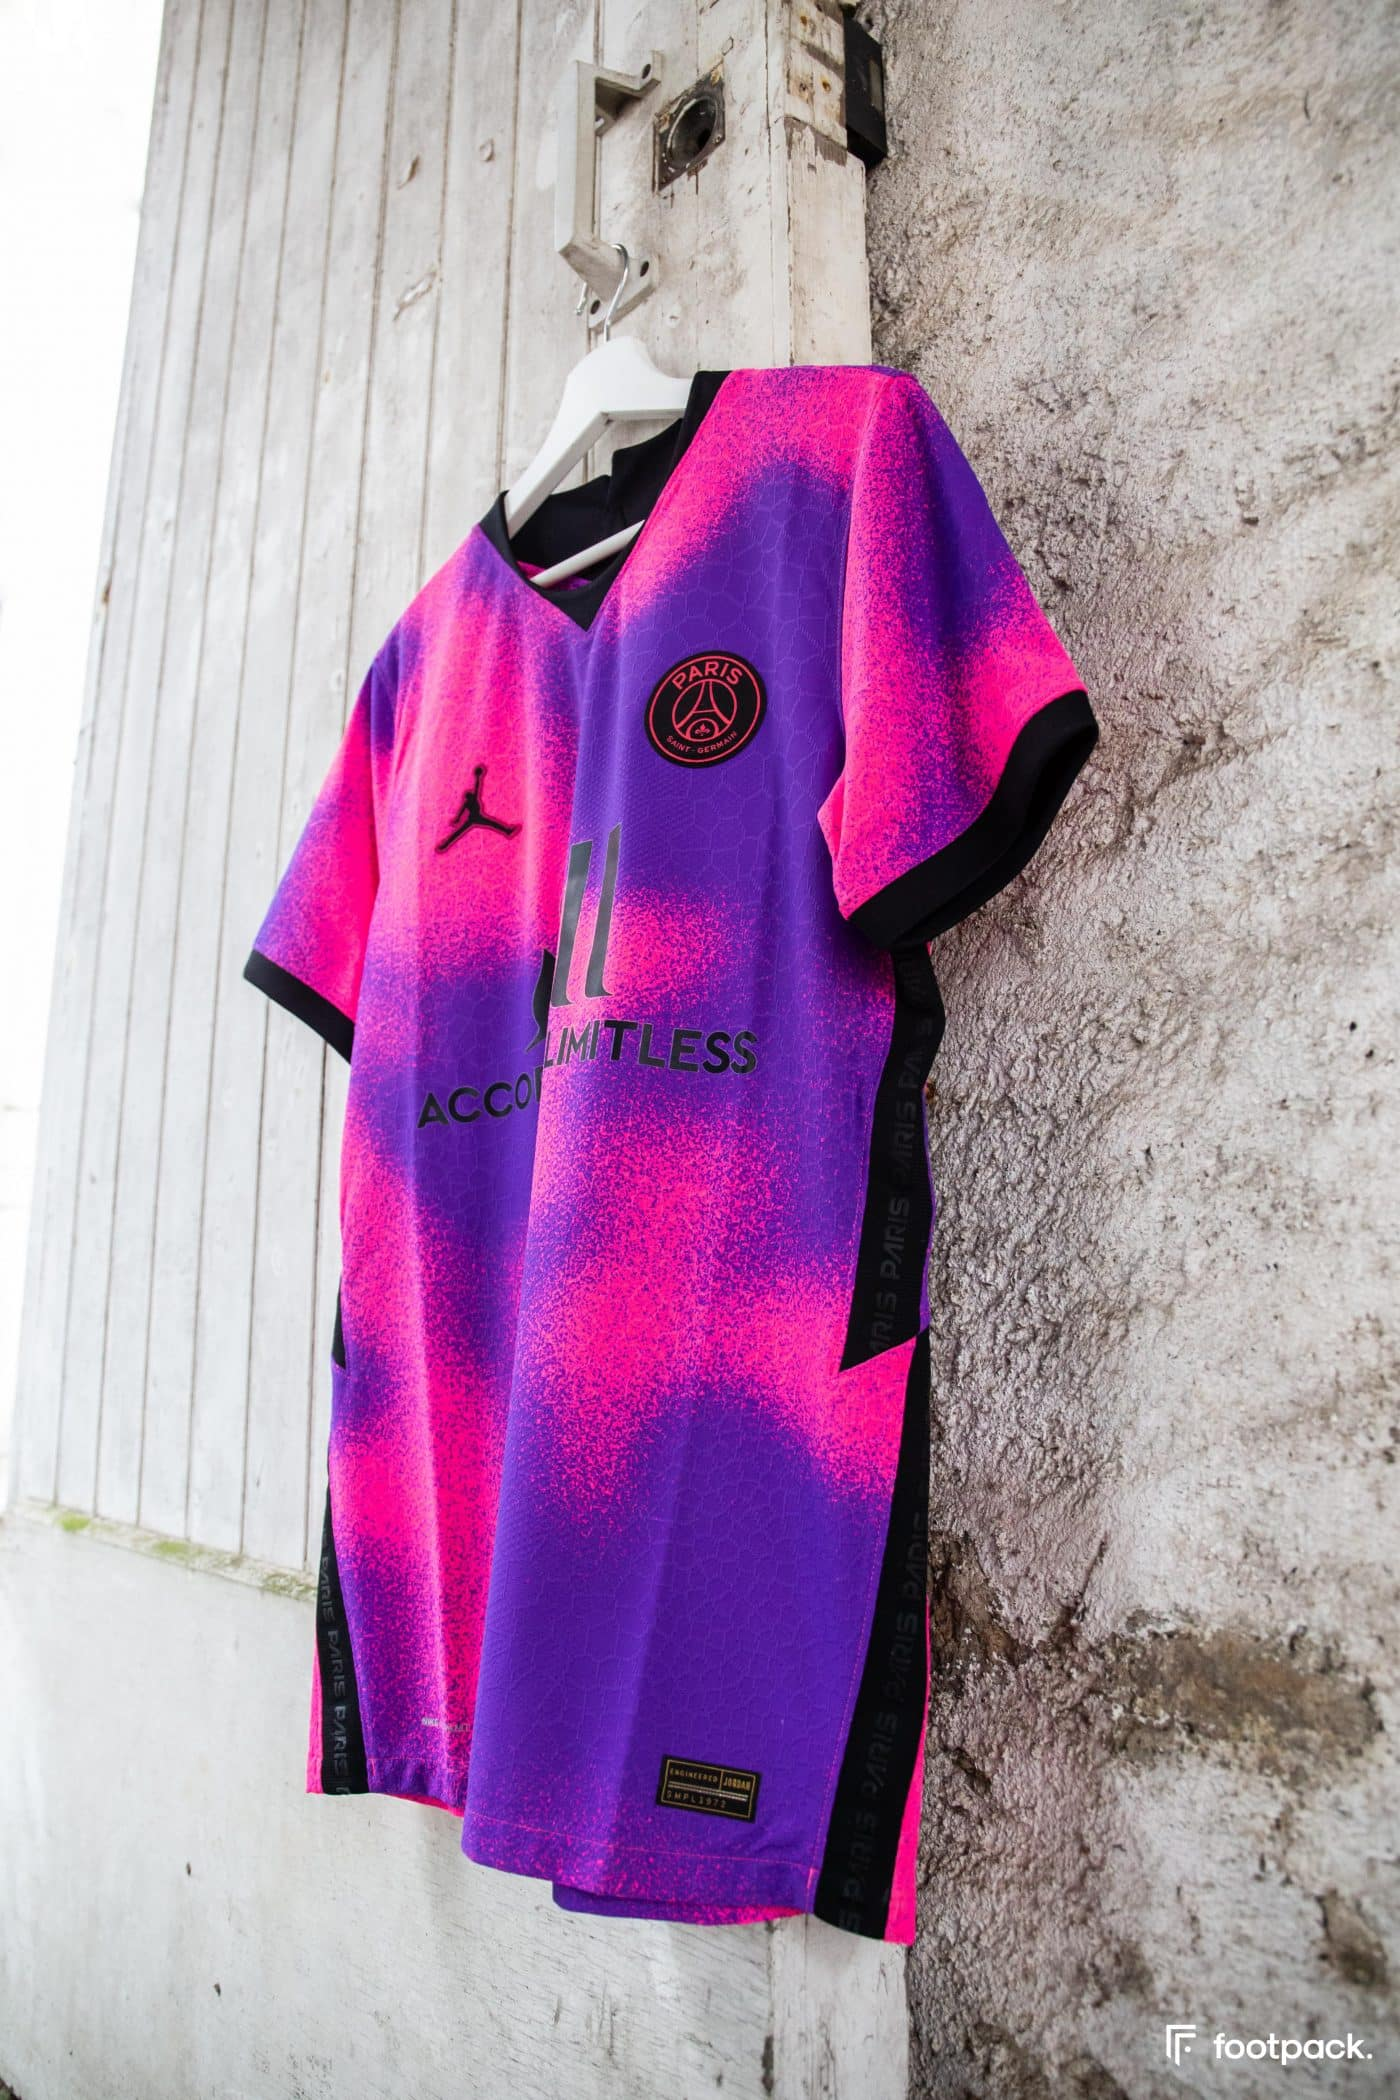 maillot-psg-jordan-2021-footpack-4